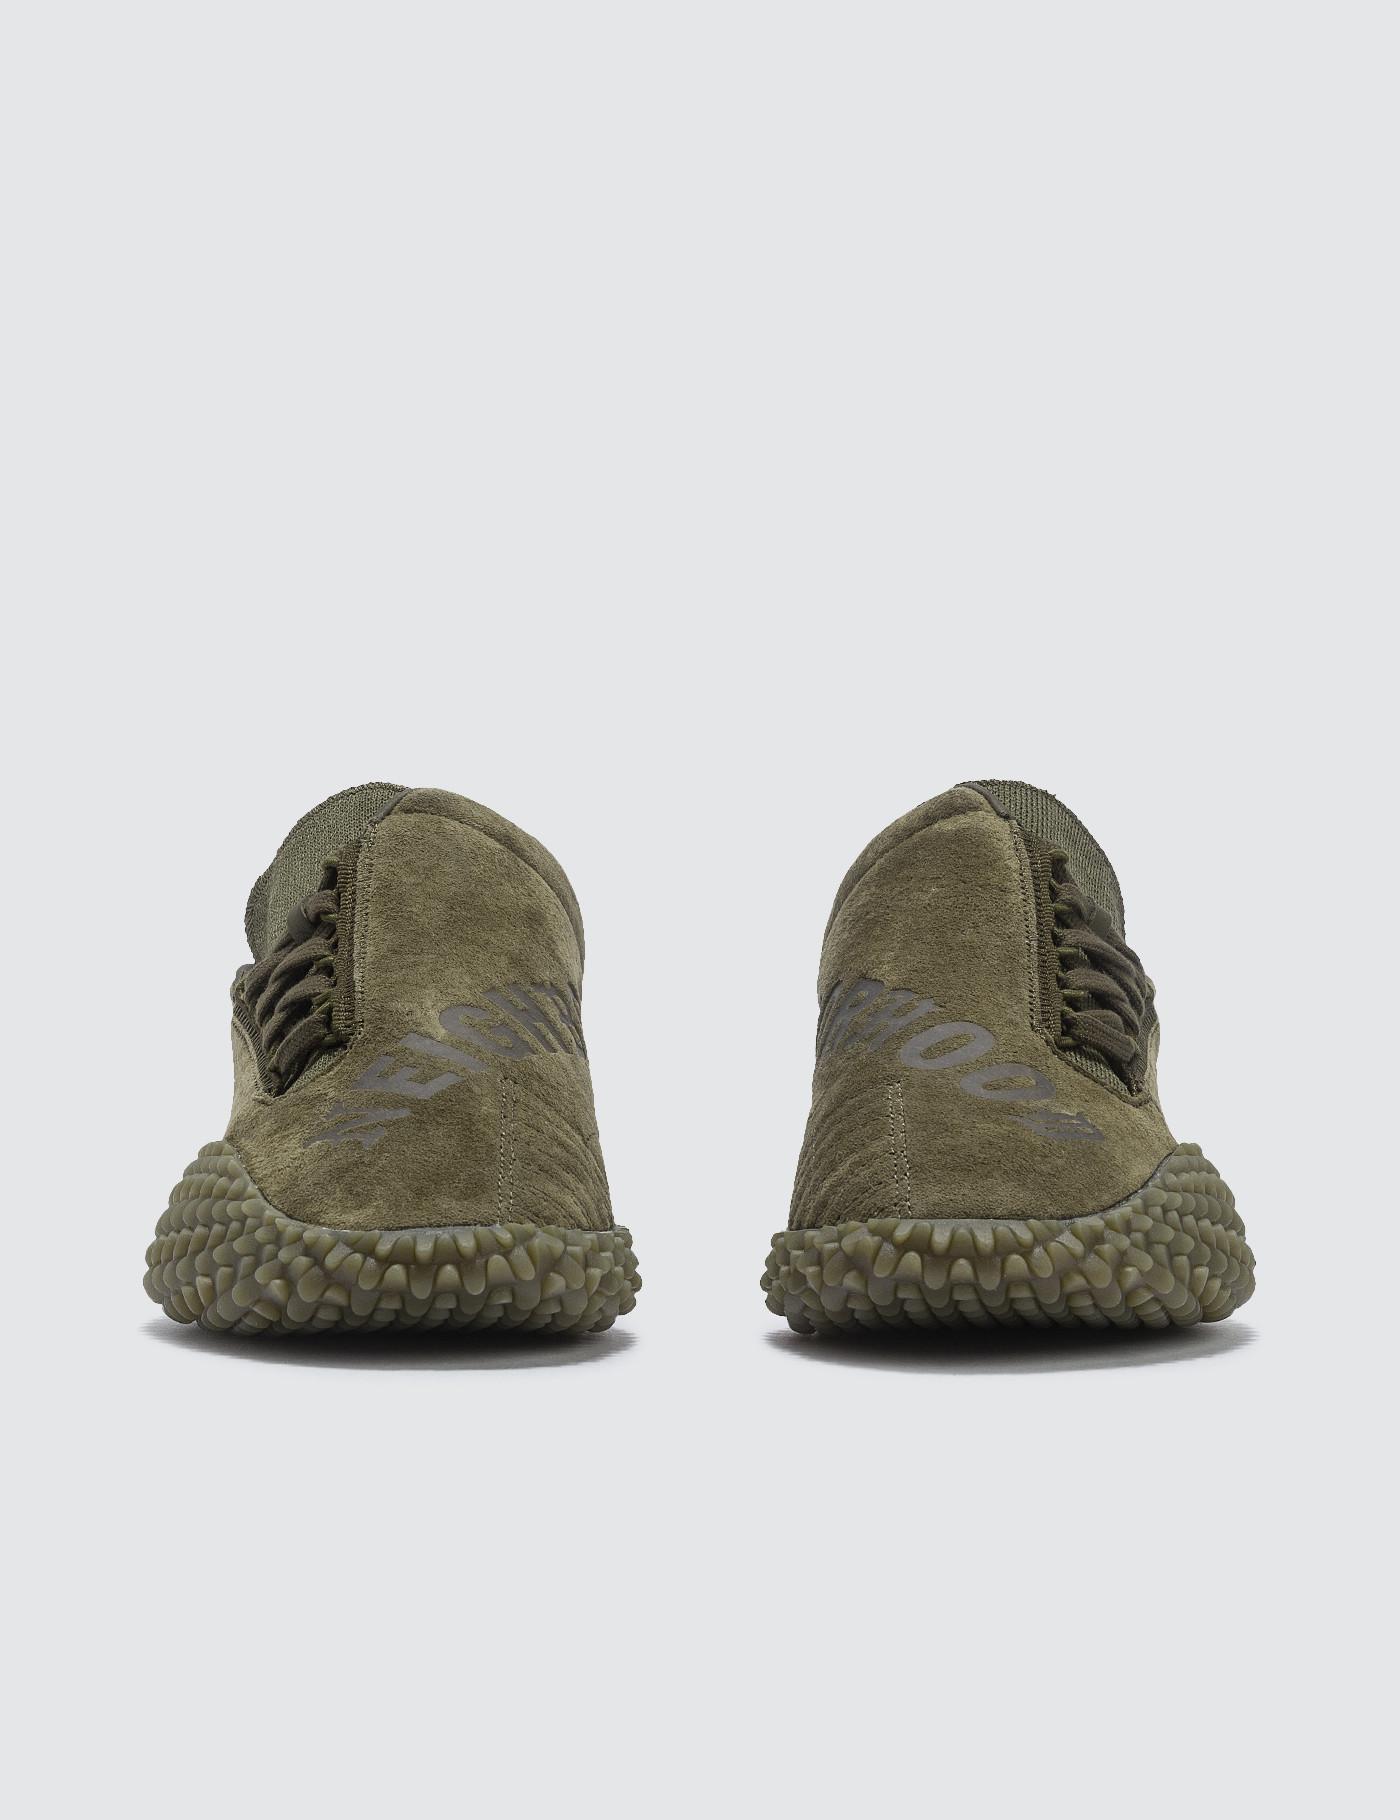 7d1026c9796f70 Lyst - adidas Originals Neighborhood X Adidas Kamanda 01 in Green ...